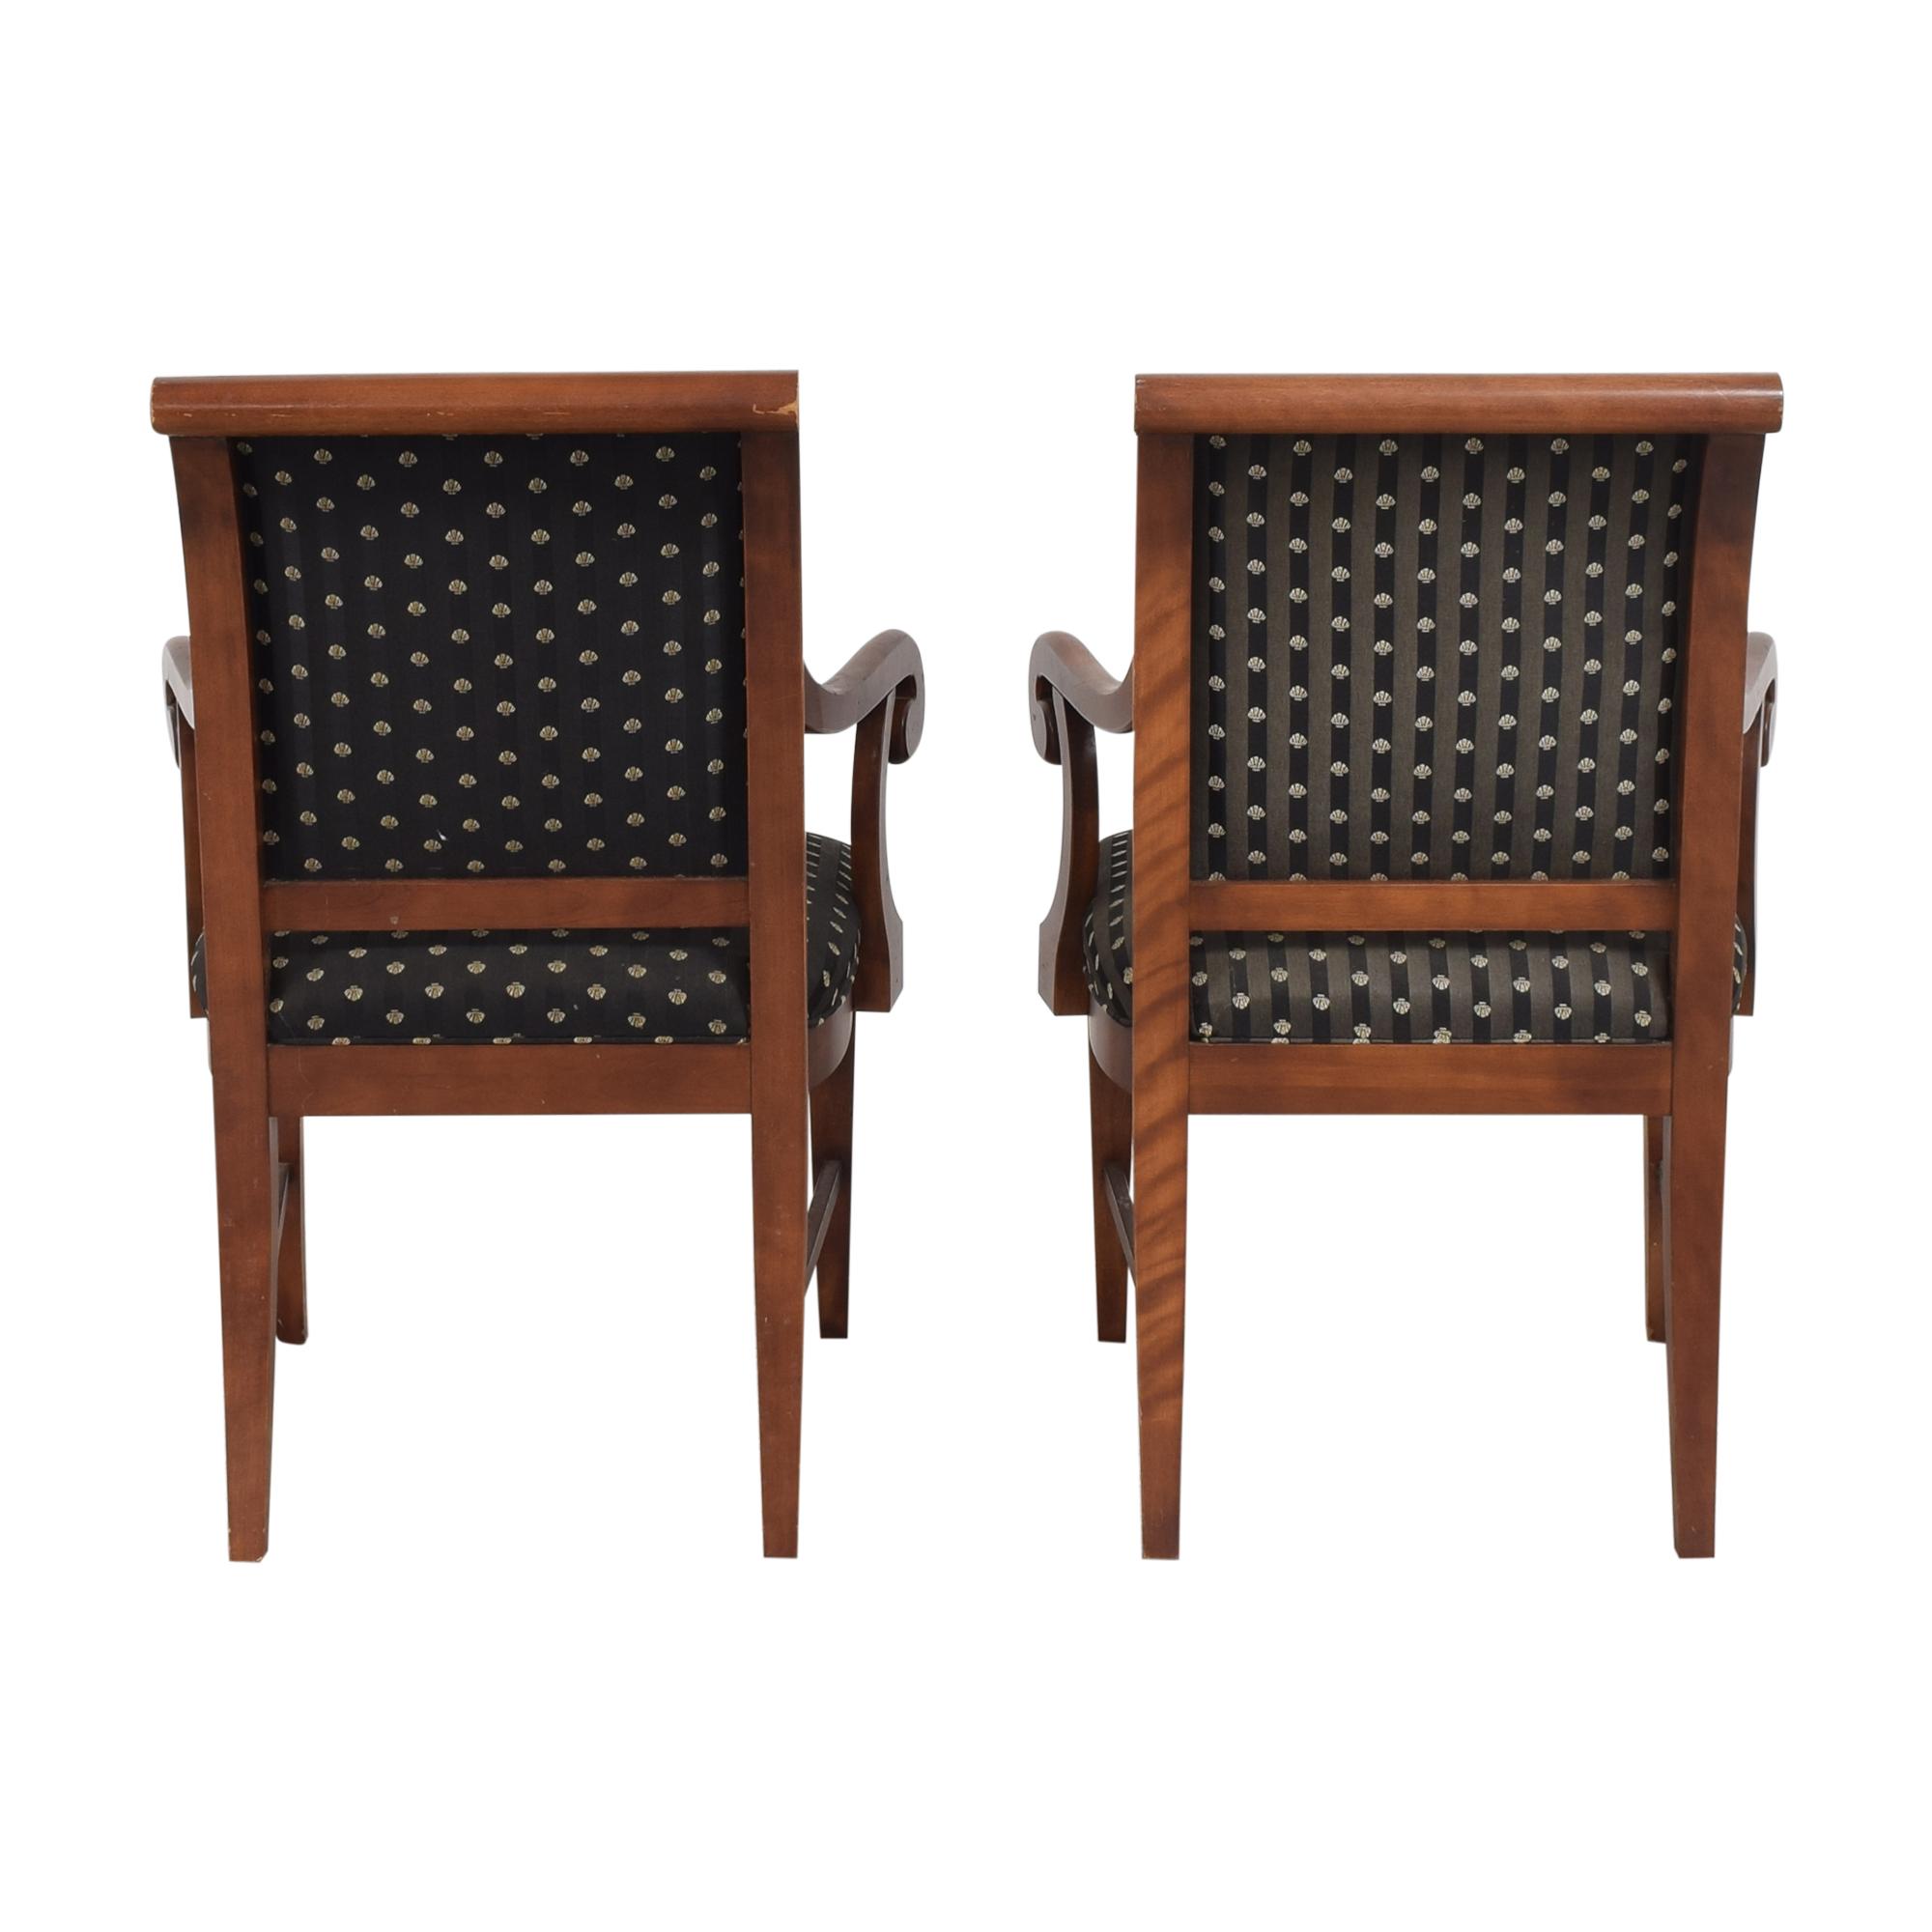 Leda Furniture Leda Furniture Arm Chairs coupon